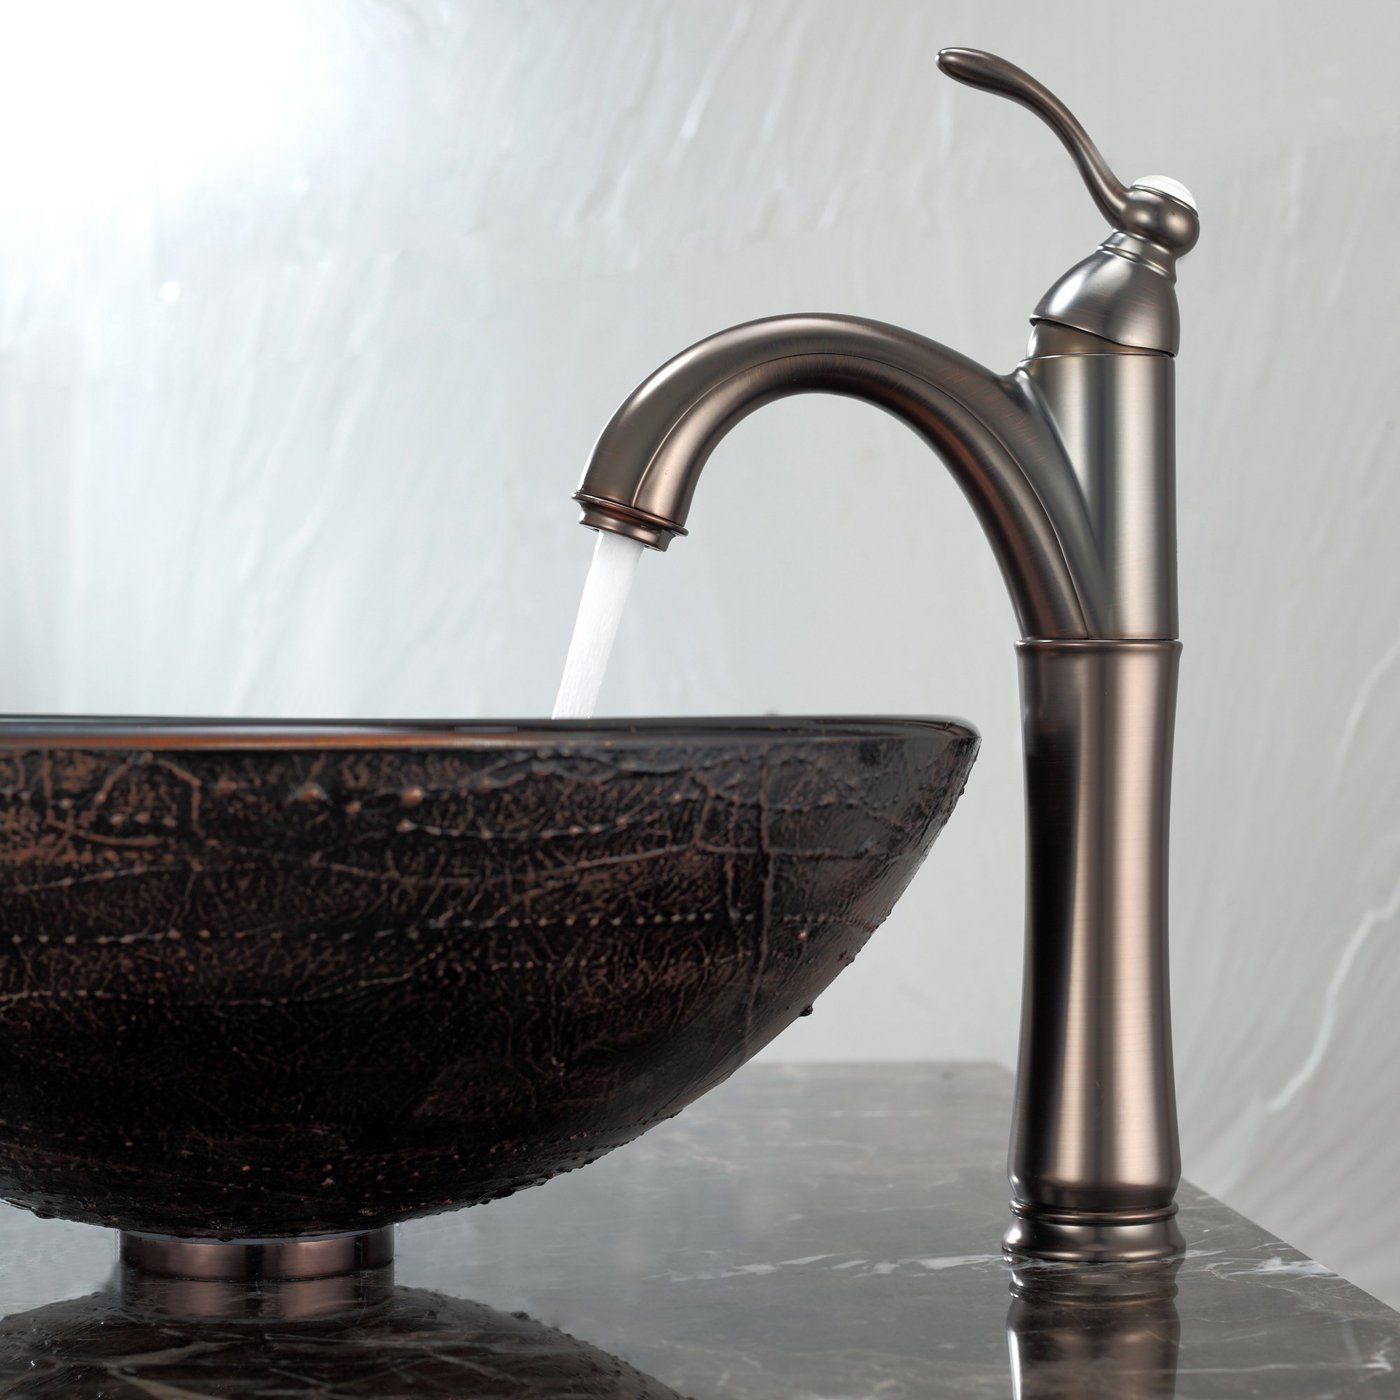 Kraus C-GV-580-12mm-1005ORB Copper Exquisiten Glass Vessel Sink and ...